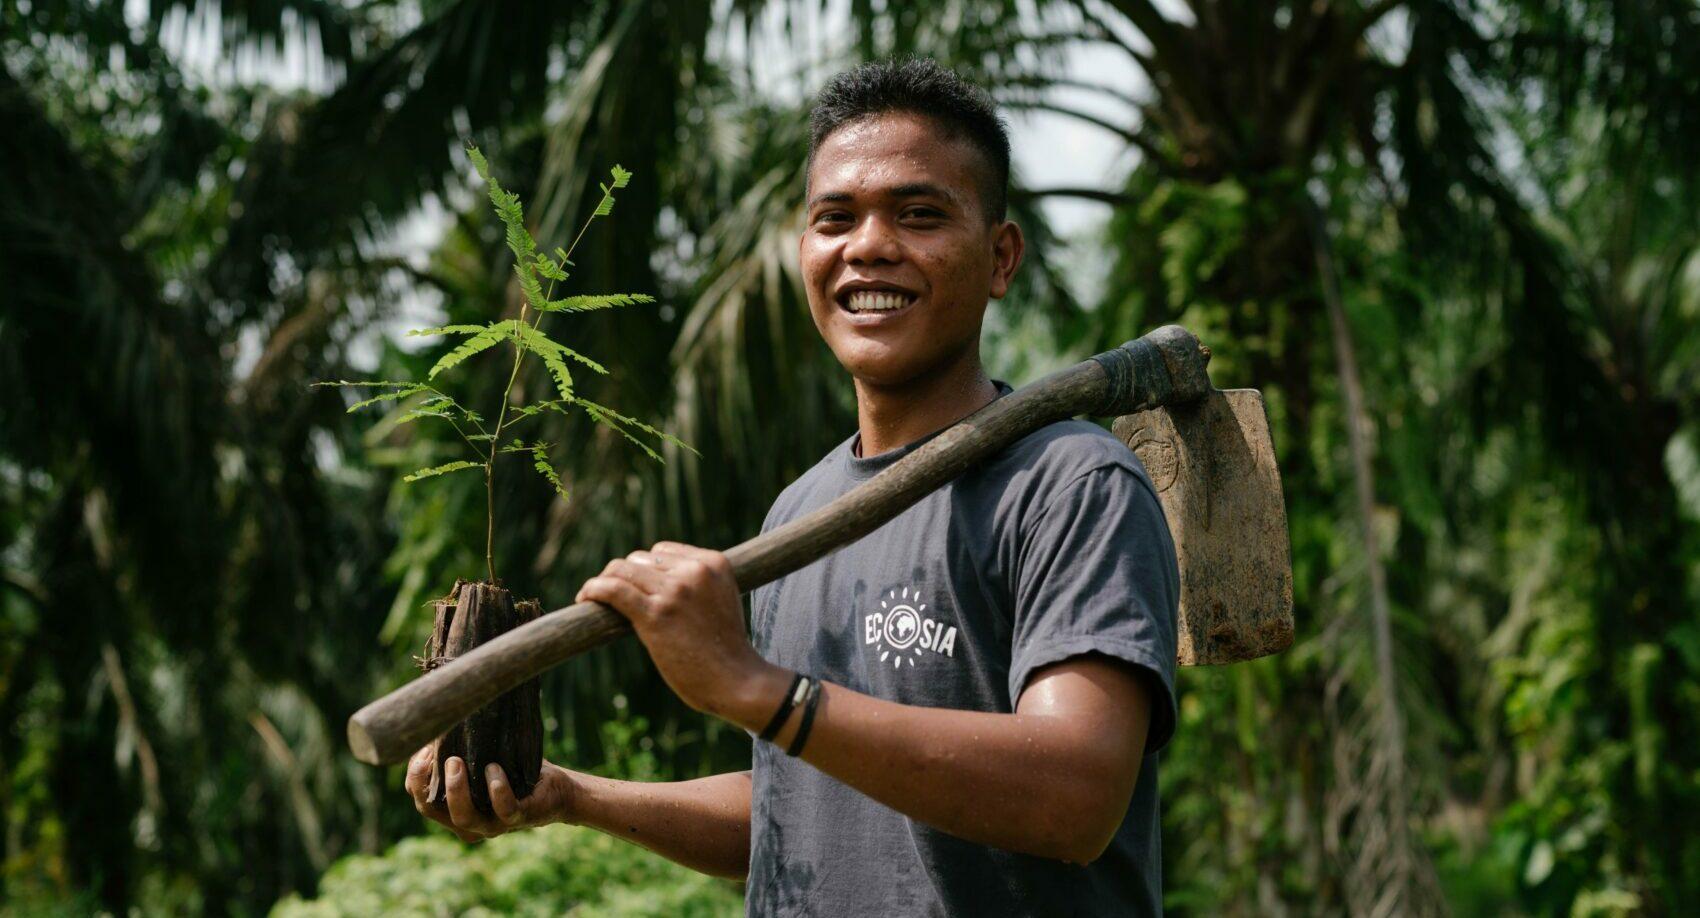 Ecosia planting trees